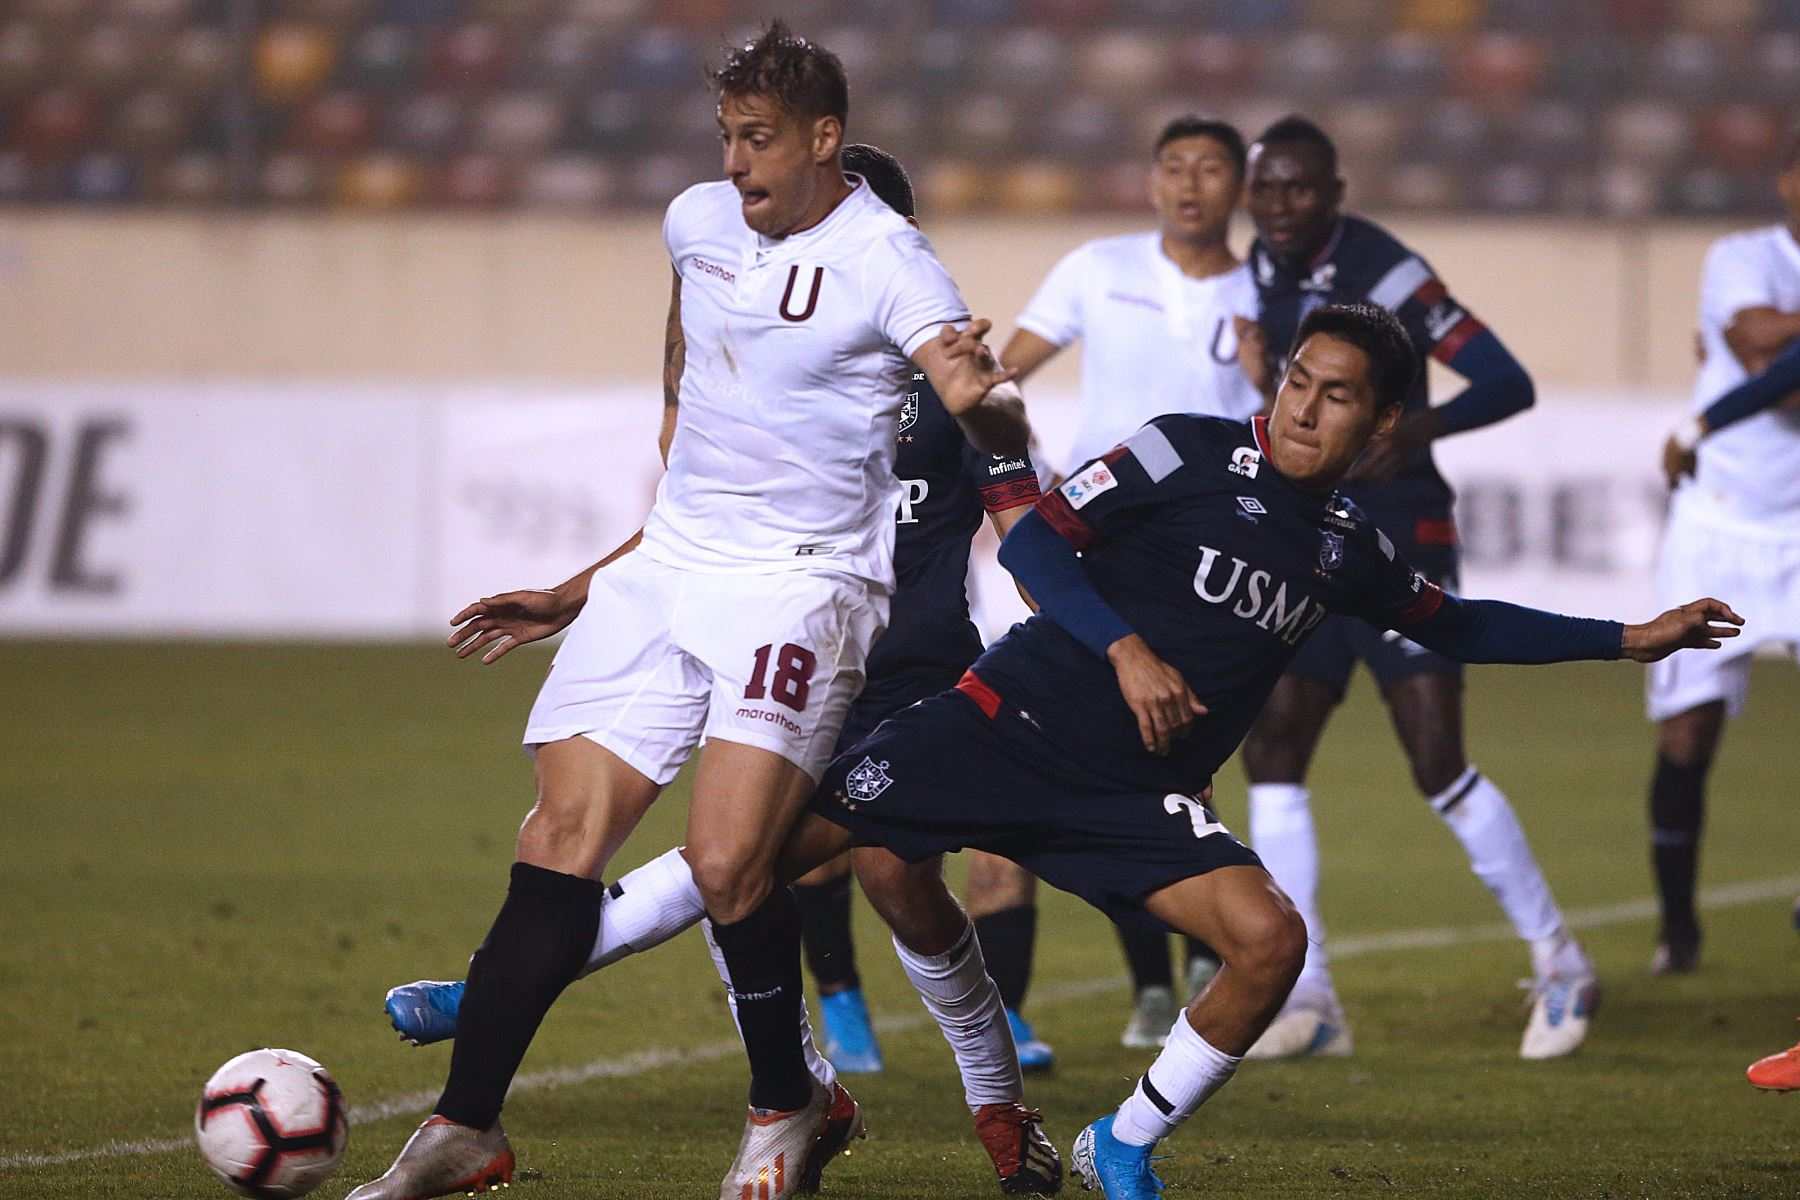 Germán Denis de Universitario vs. San Martín, empatan 0-0 en el estadio Monumental de Ate.Foto:ANDINA/ Vidal Tarqui